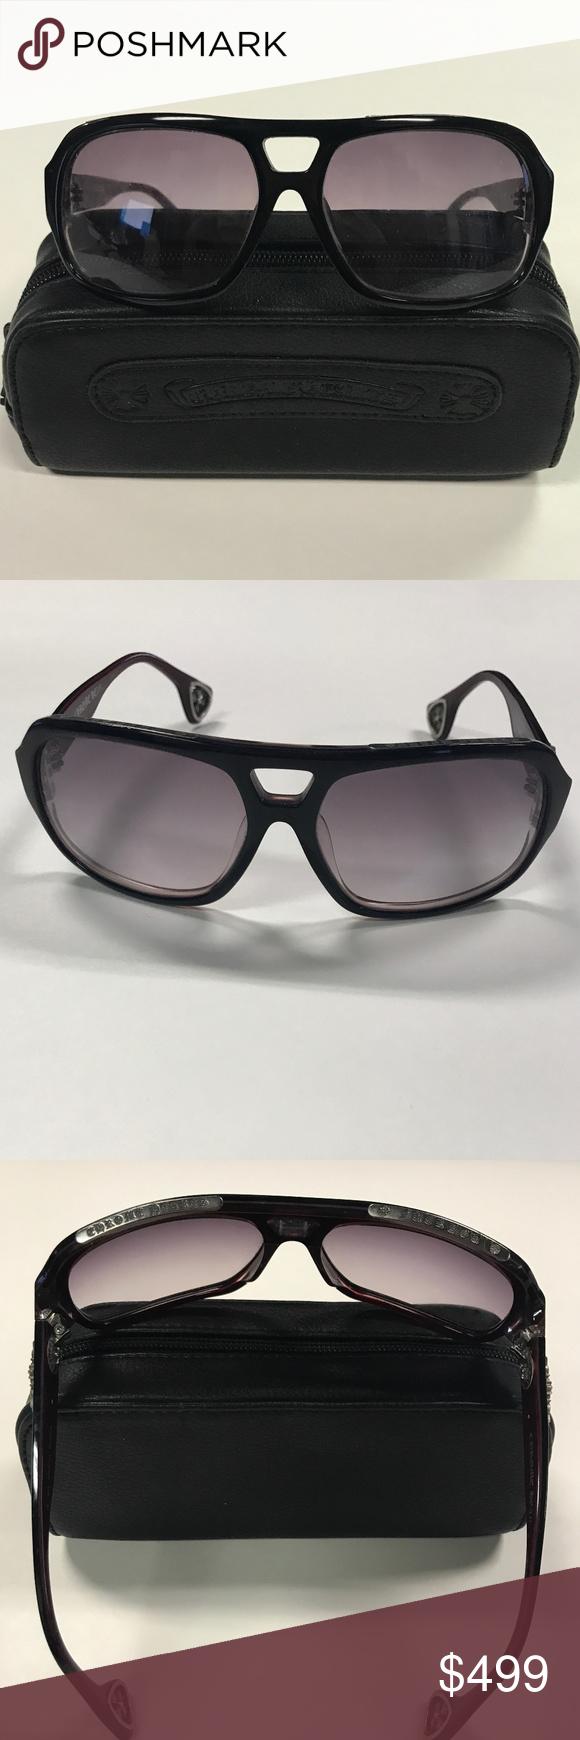 b4f75f53016 Chrome Hearts Boink Sunglasses Unisex Black Red Unisex. Originally  1650. Chrome  Hearts Boink